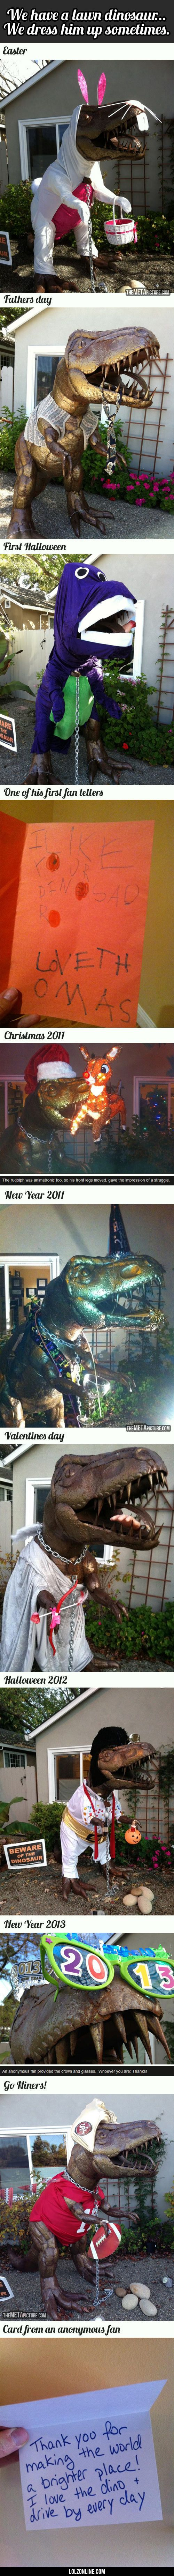 Dug the T-Rex #lol